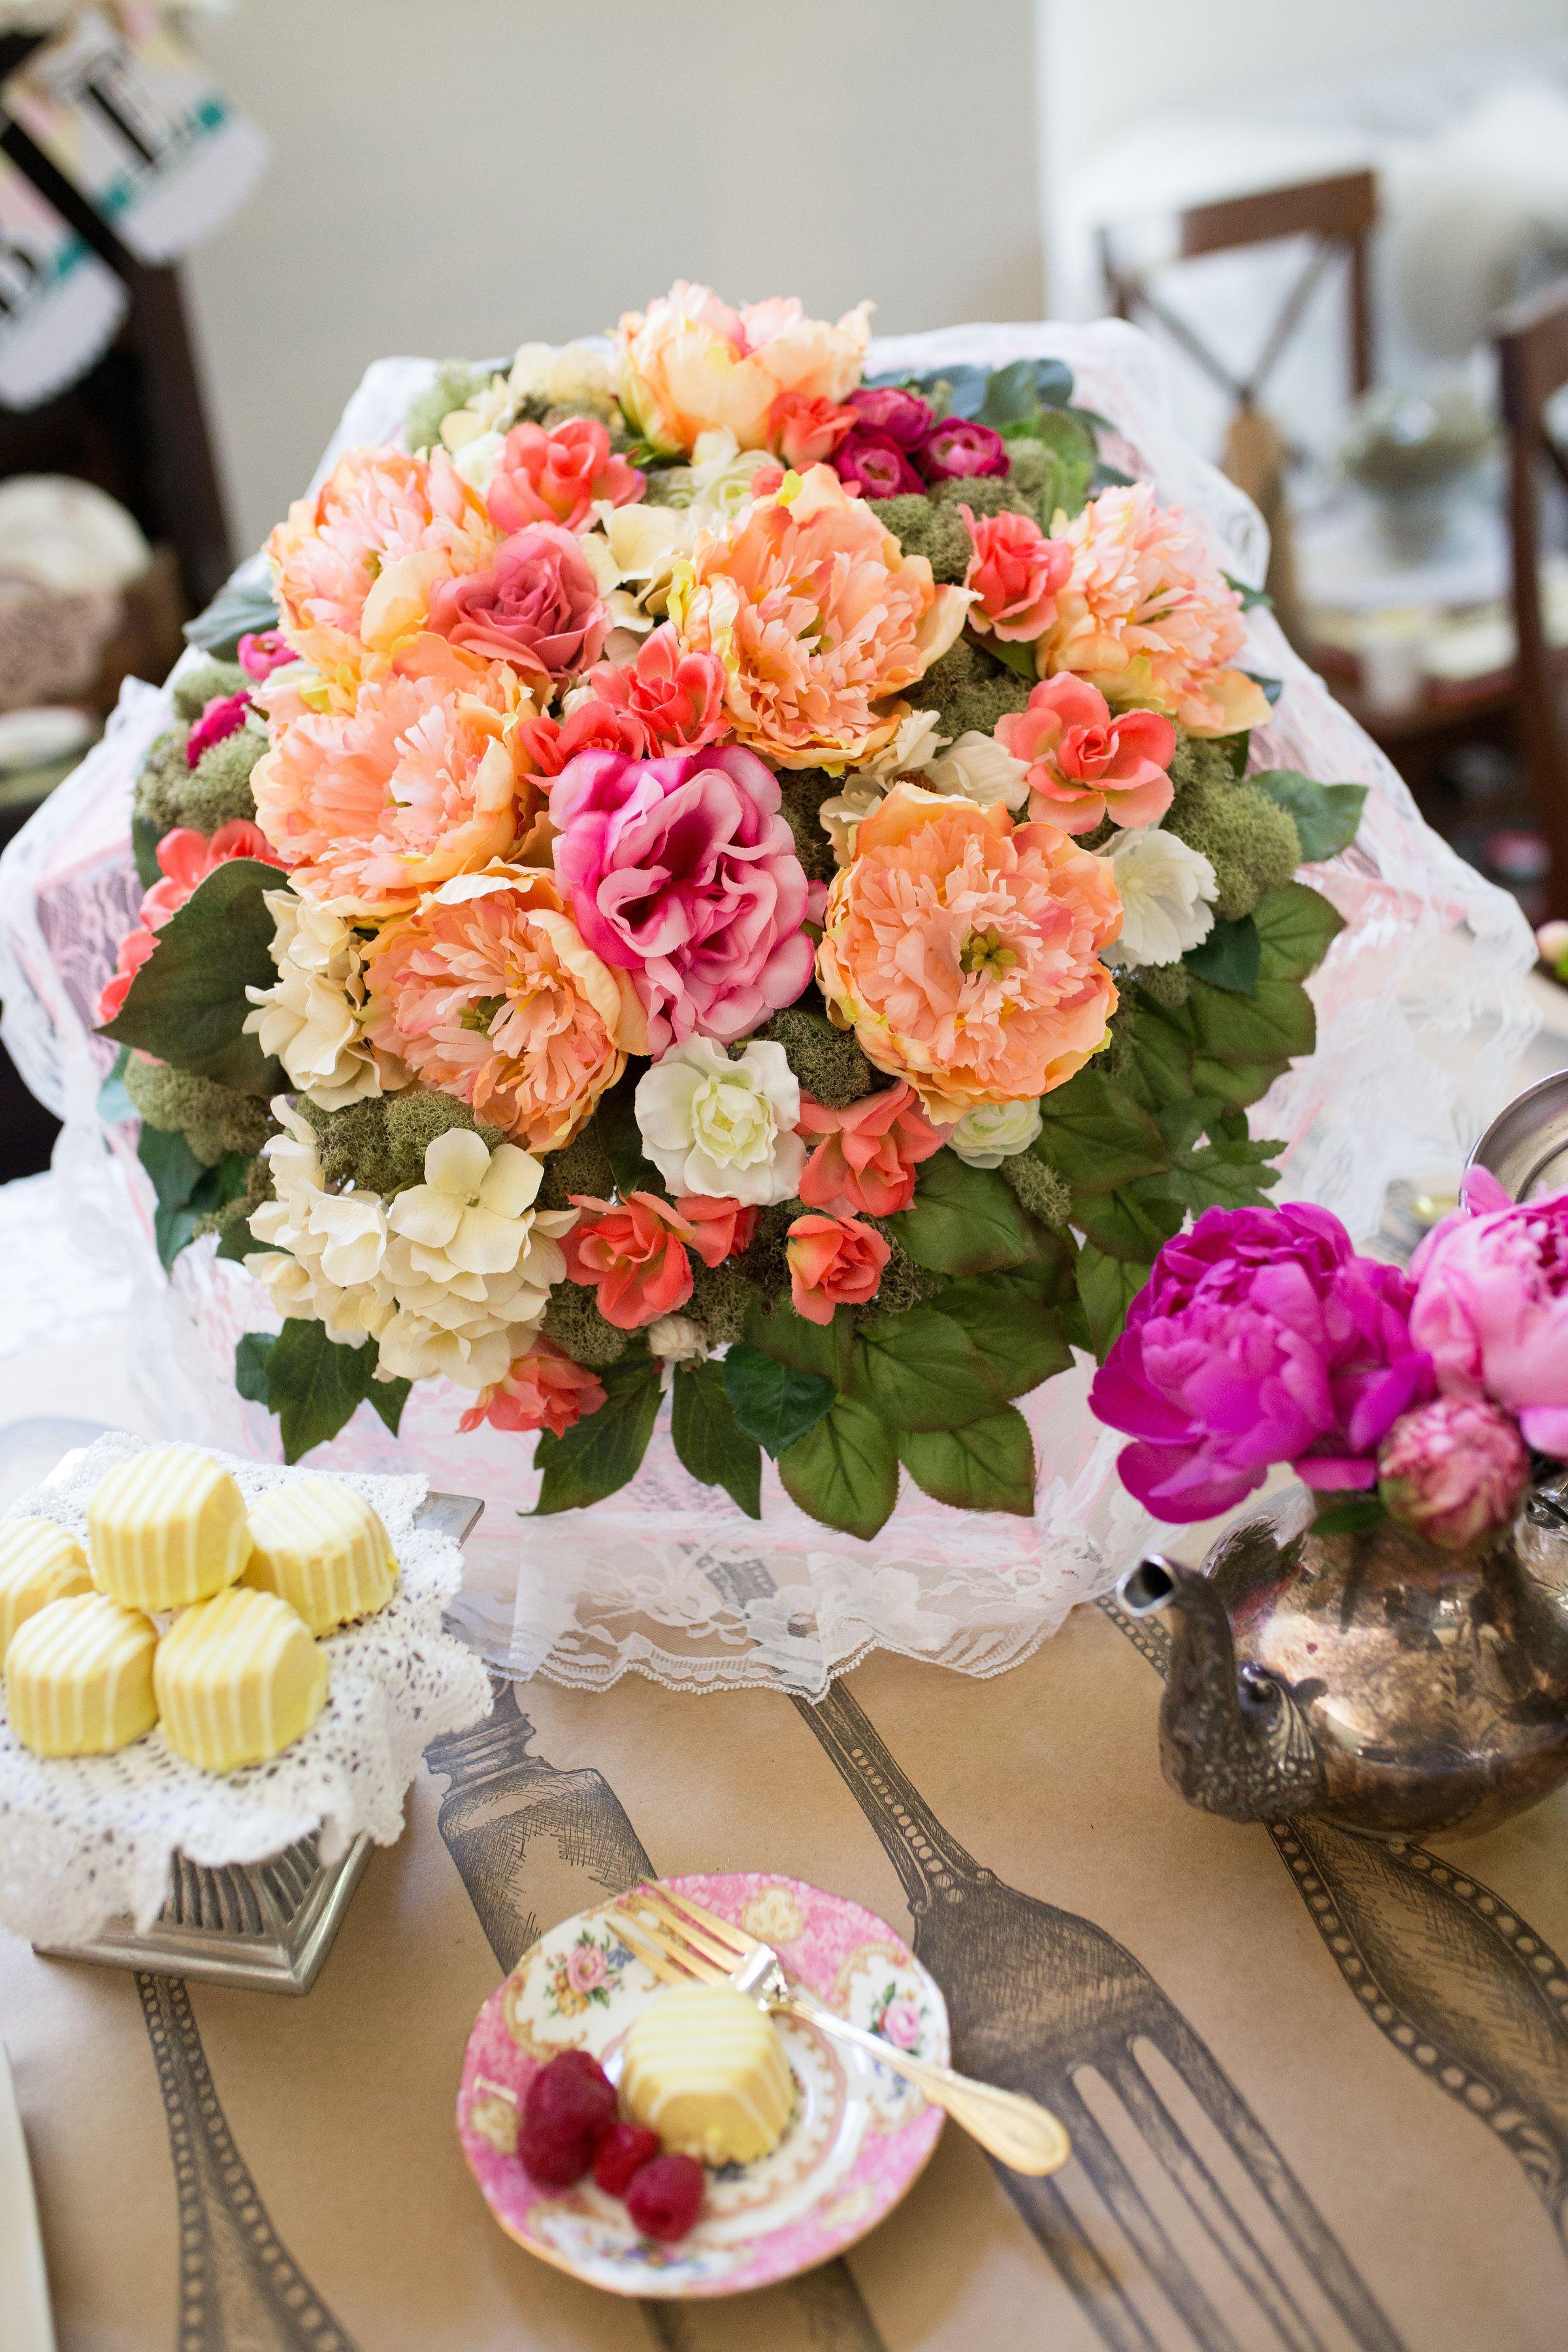 craft ideas homemade bridal shower decoration%0A Shoppingmeetsinspiration destination filled with of shareworthy craft   party  wedding  u     classroom ideas that won u    t break the bank